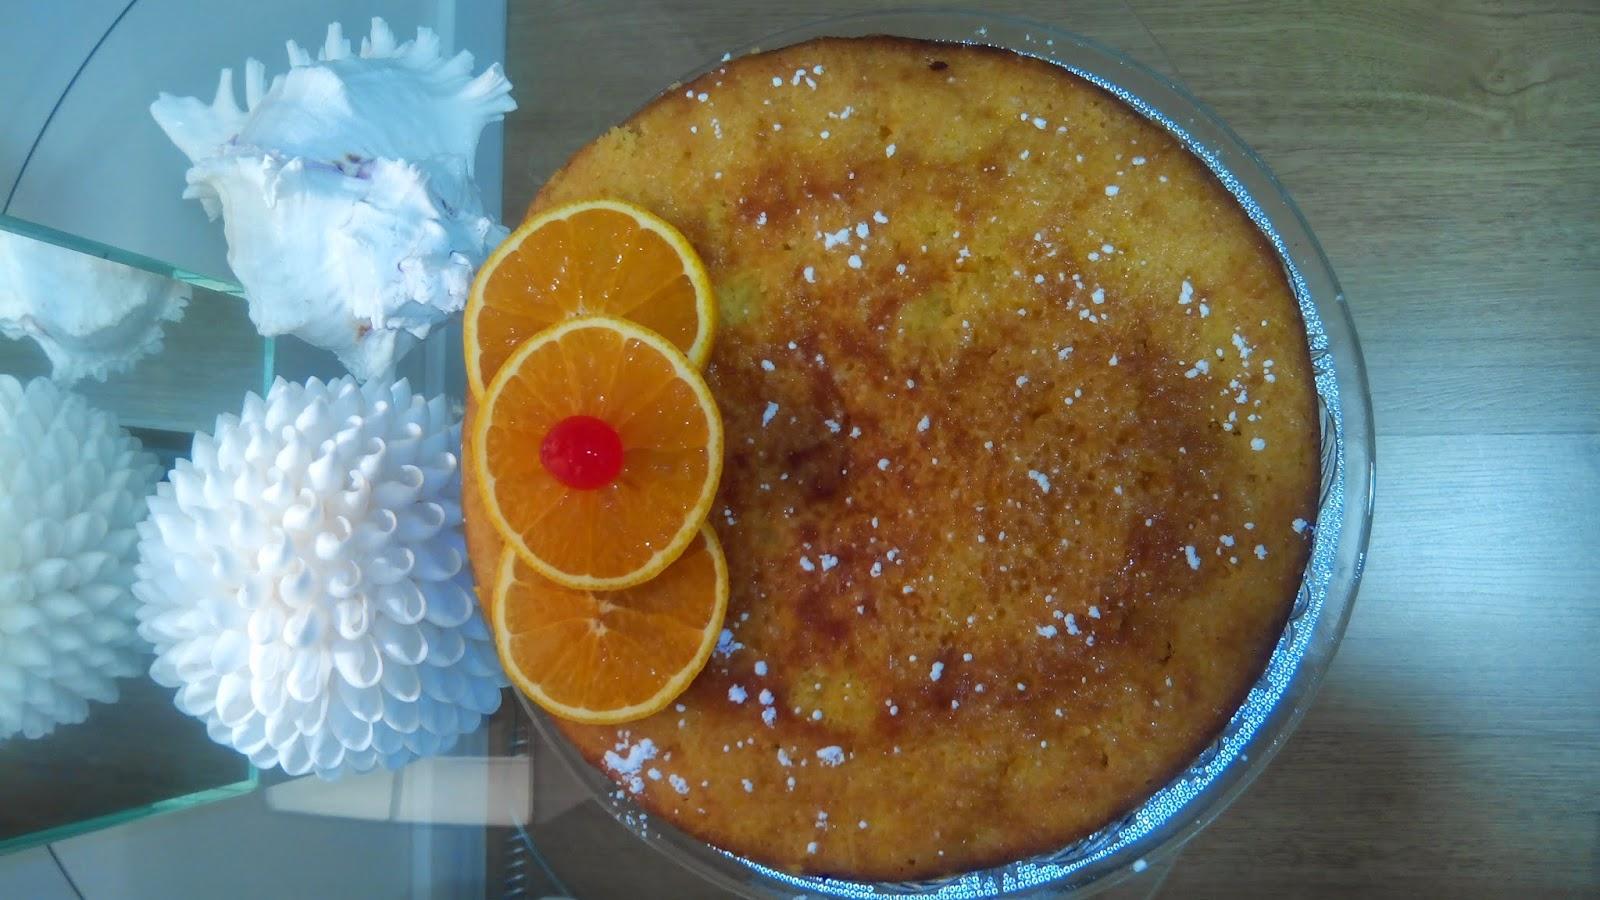 Bizcocho, Bizcocho de naranja, Bizcocho húmedo, Bizcocho jugoso, naranja,